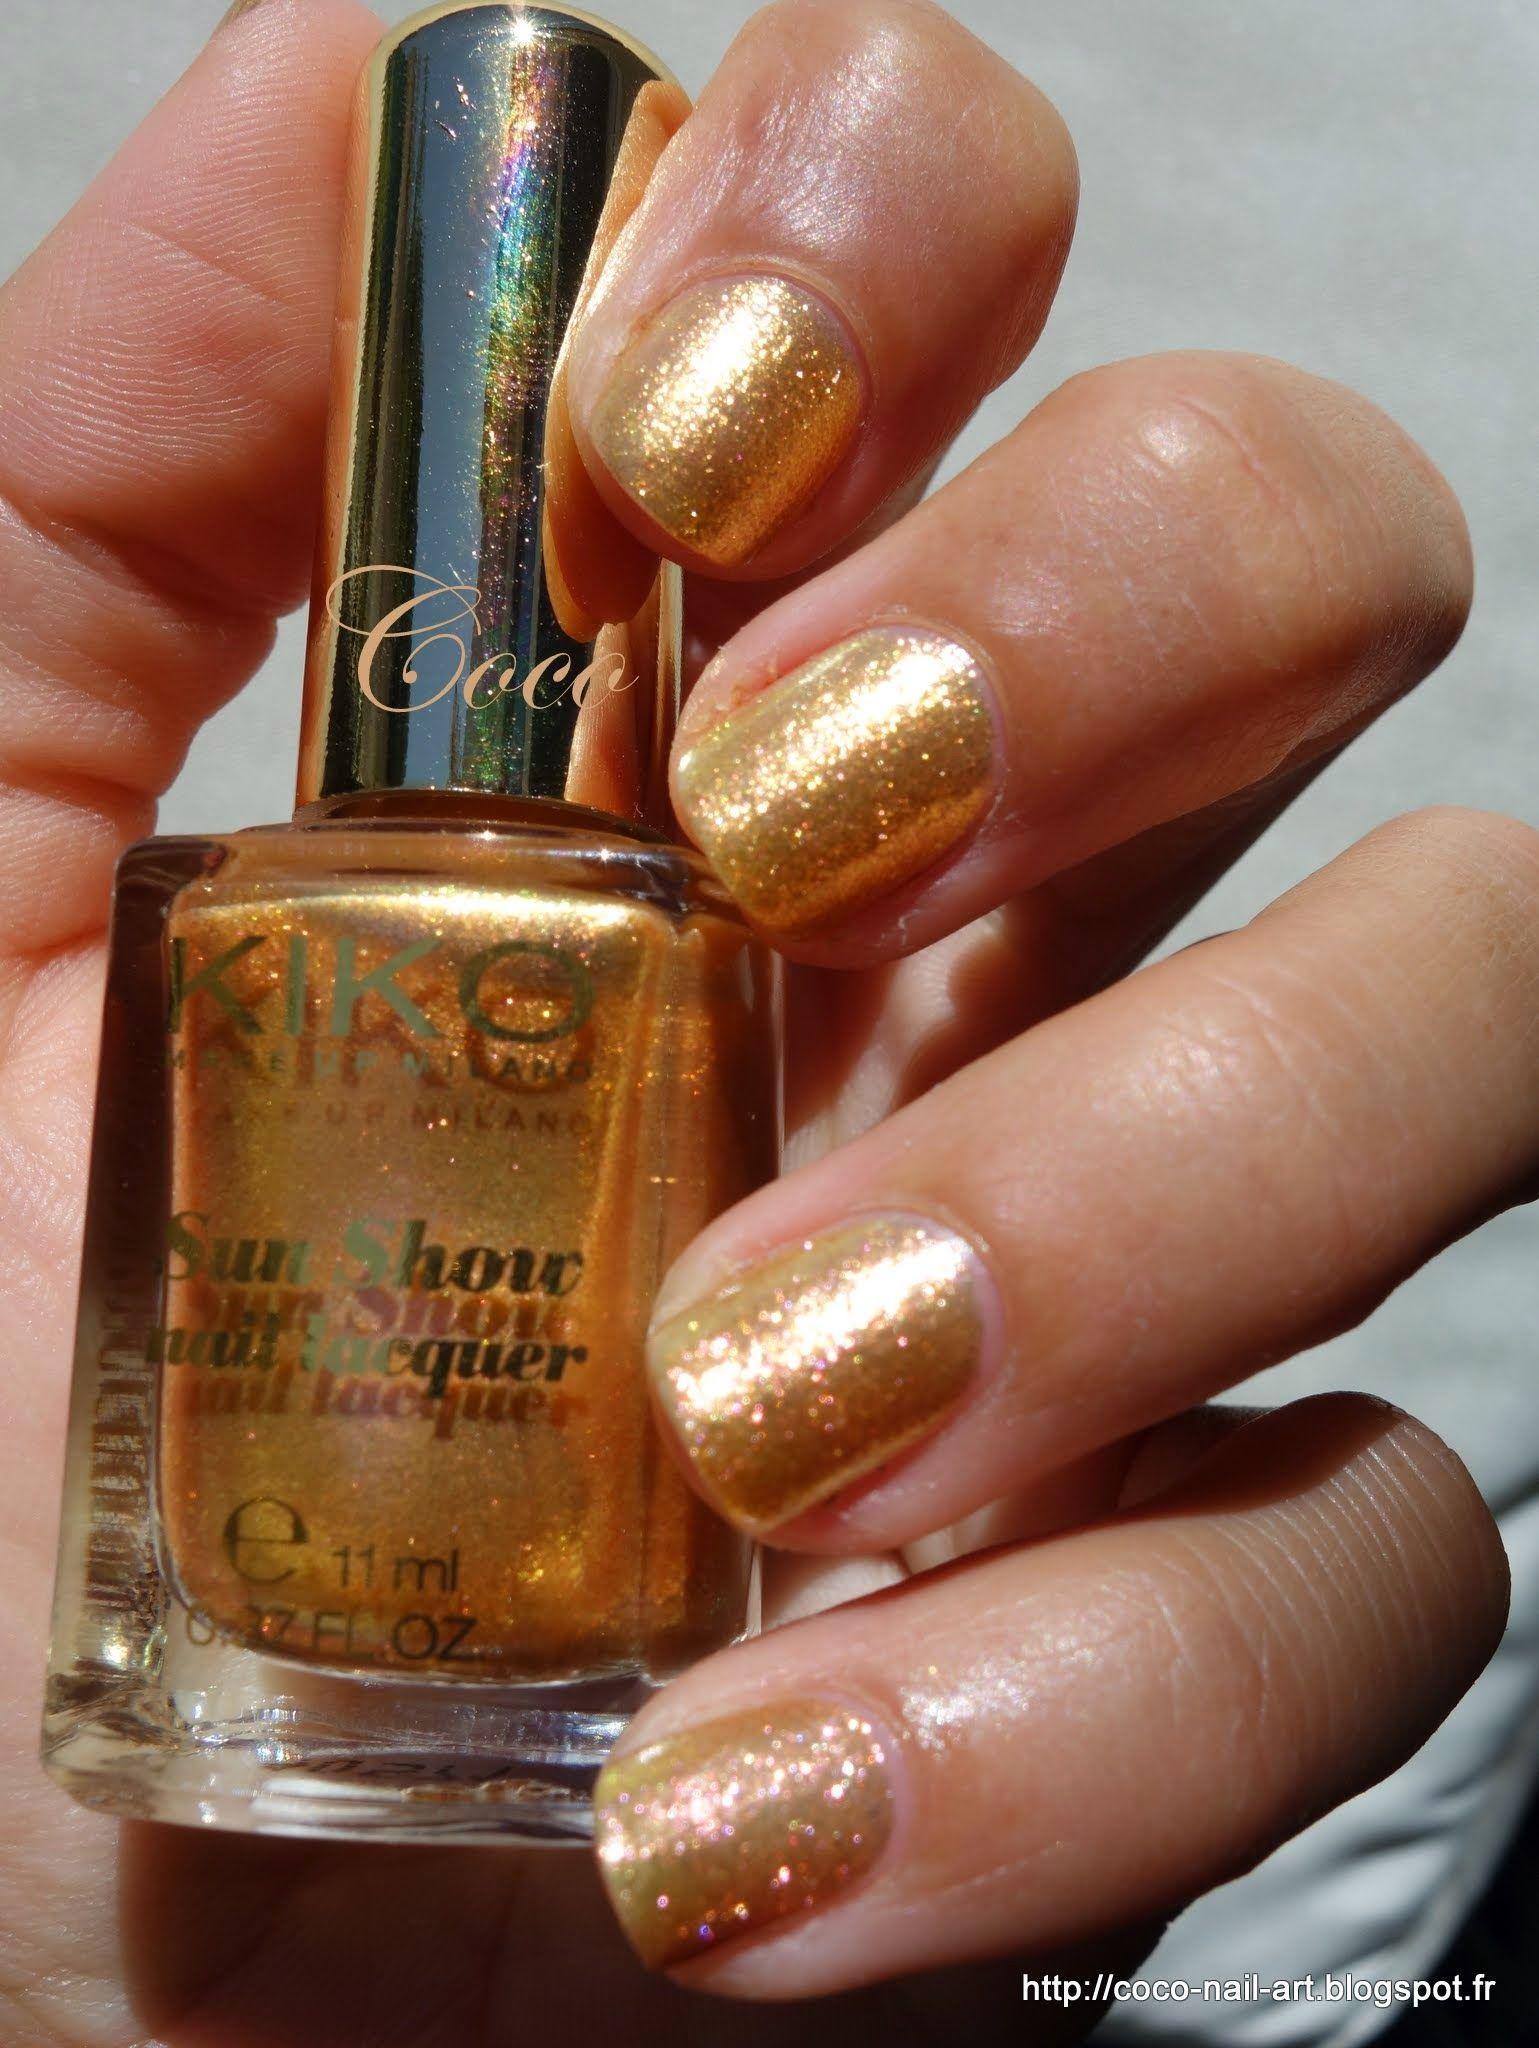 Kiko sun show n467 quindim gold httpcoco nail artspot kiko sun show n467 quindim gold httpcoco nail prinsesfo Gallery